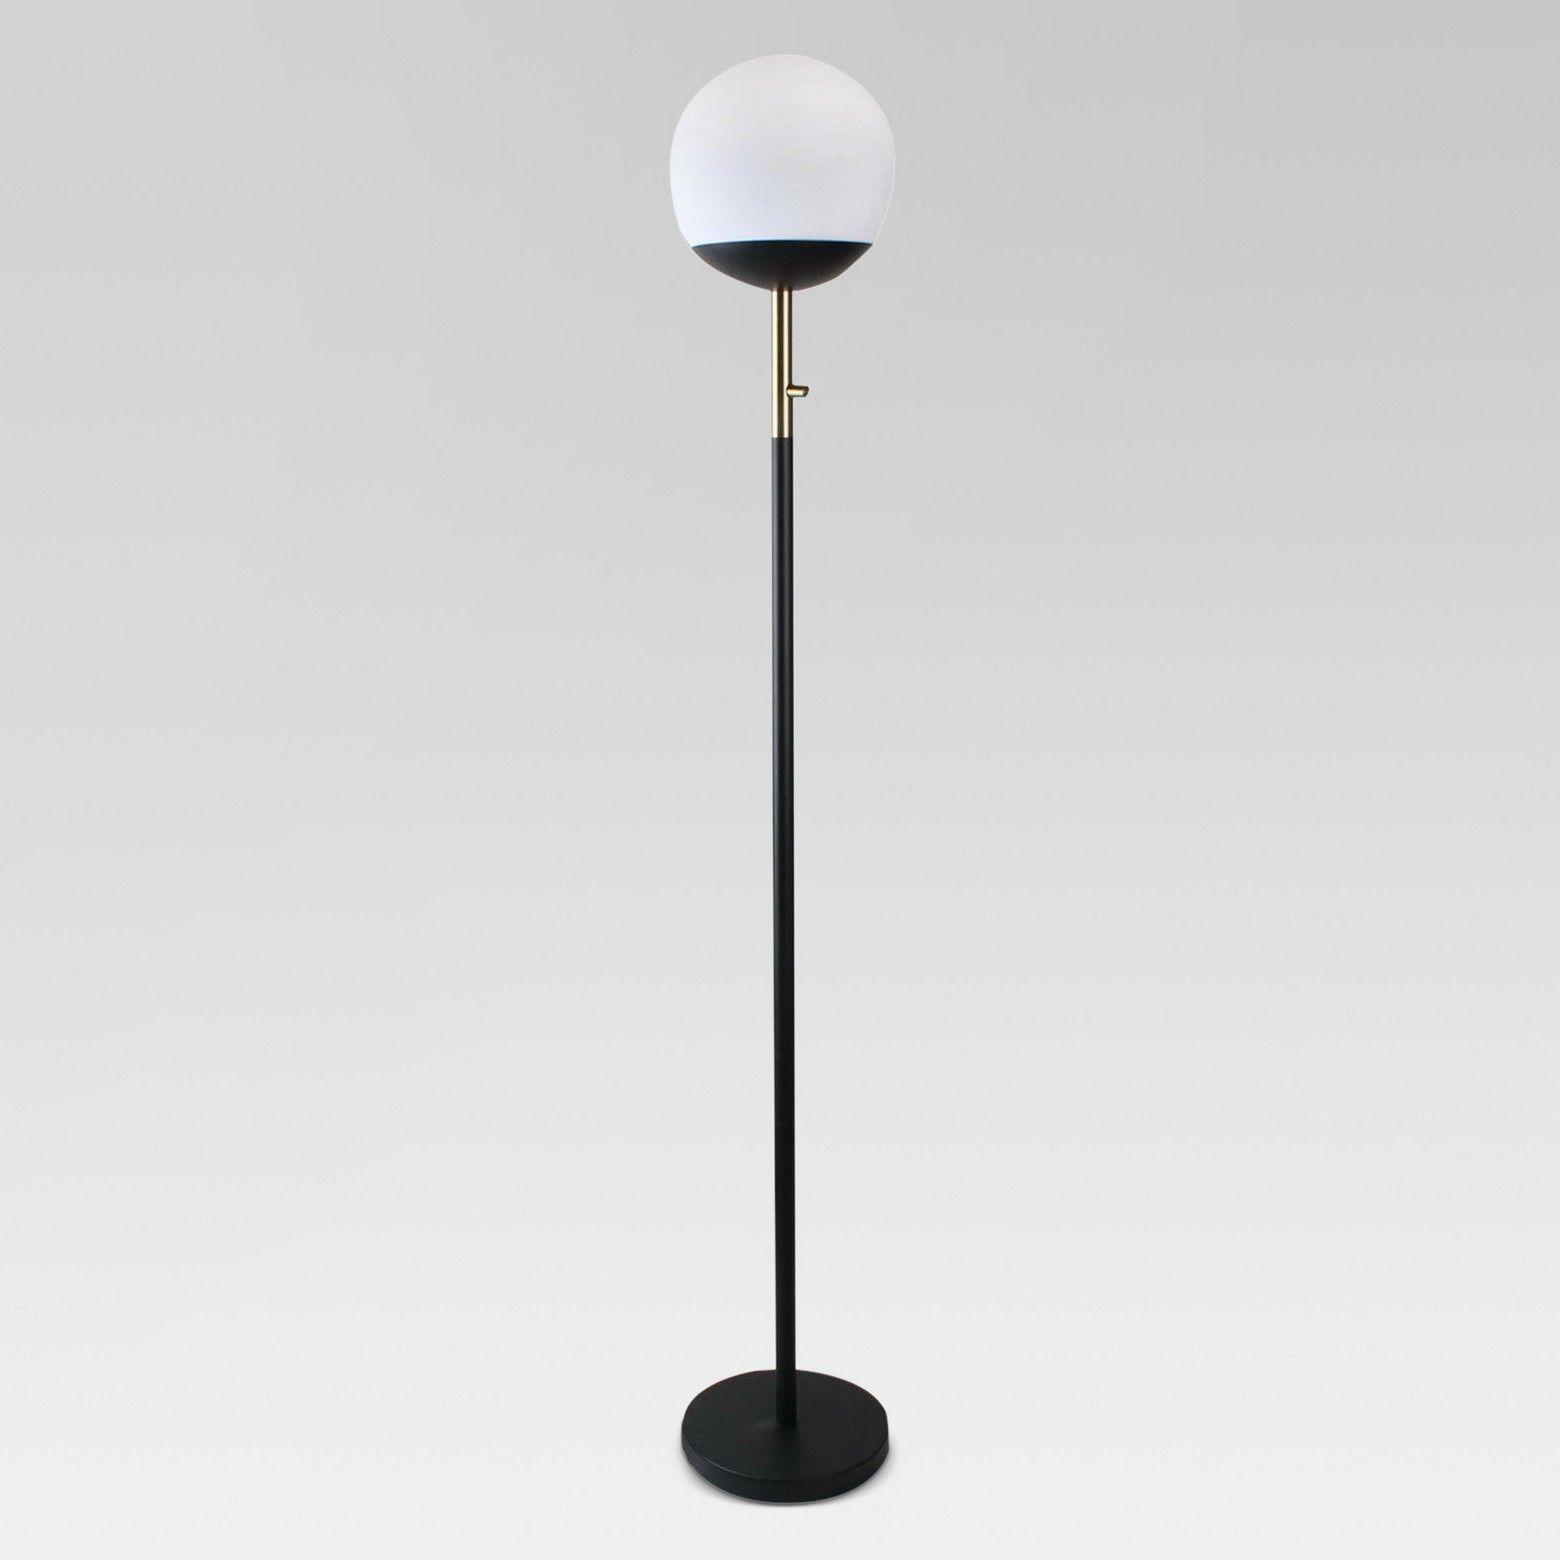 Globe Head Floor Led Lamp Black Includes Energy Efficient Light Bulb Project 62 Energy Efficient Light Bulbs Black Lamps Led Table Lamp